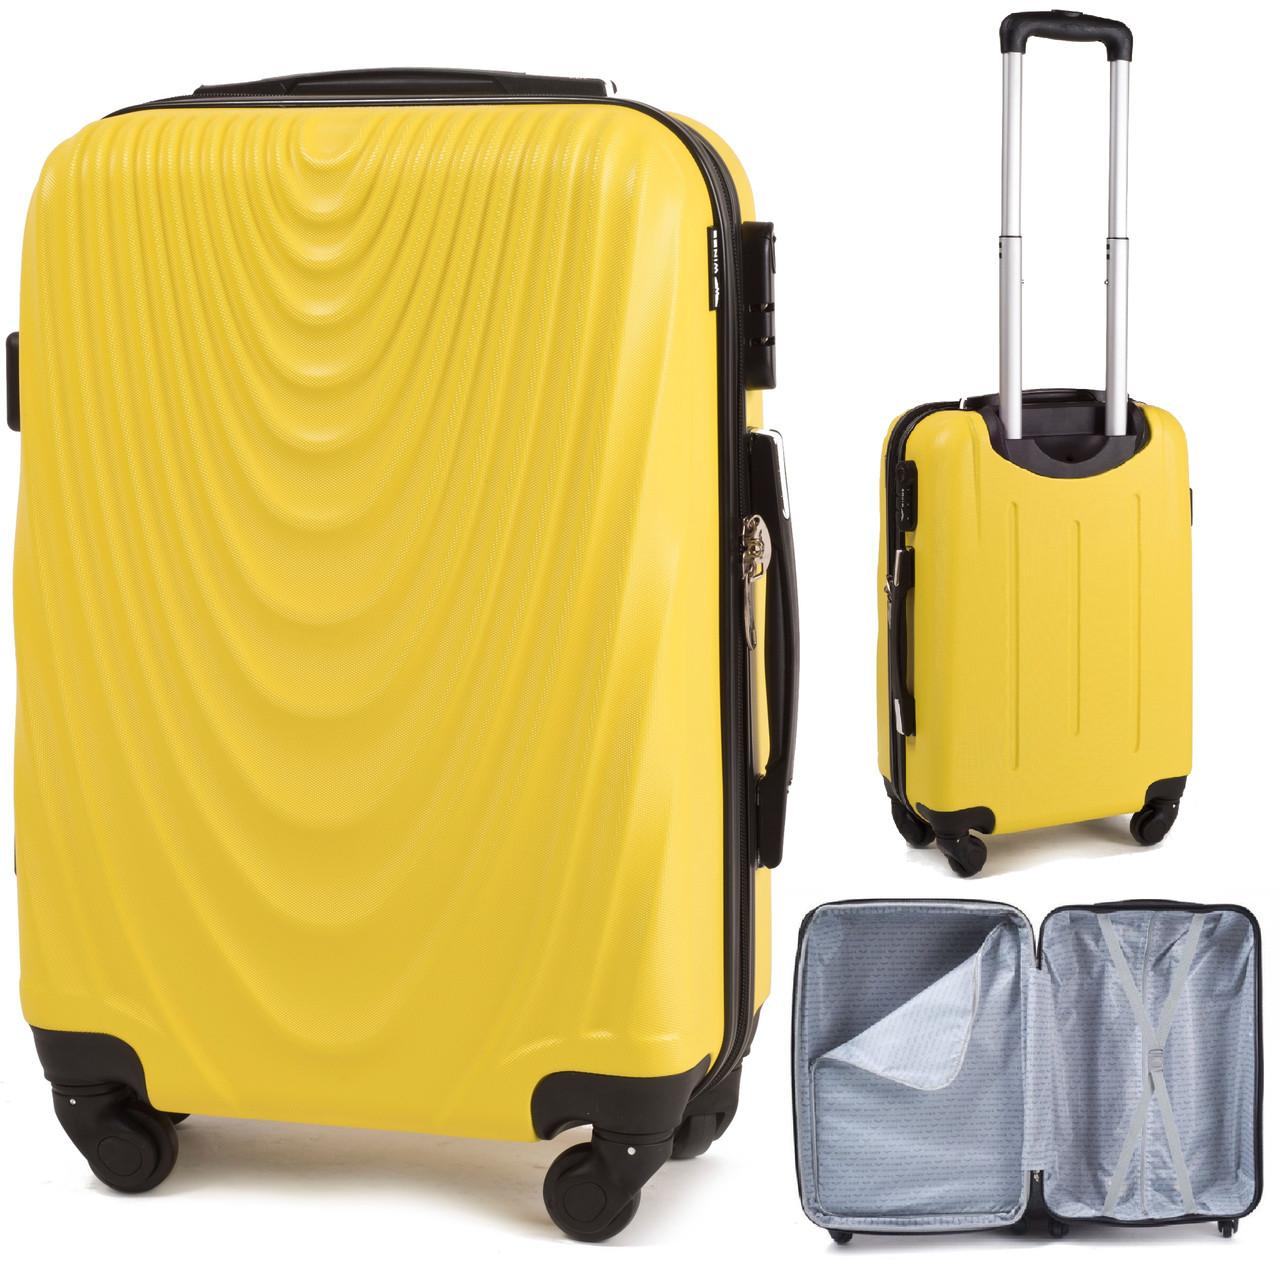 Чемодан Wings 305 пластиковый Мини (XS) Желтый